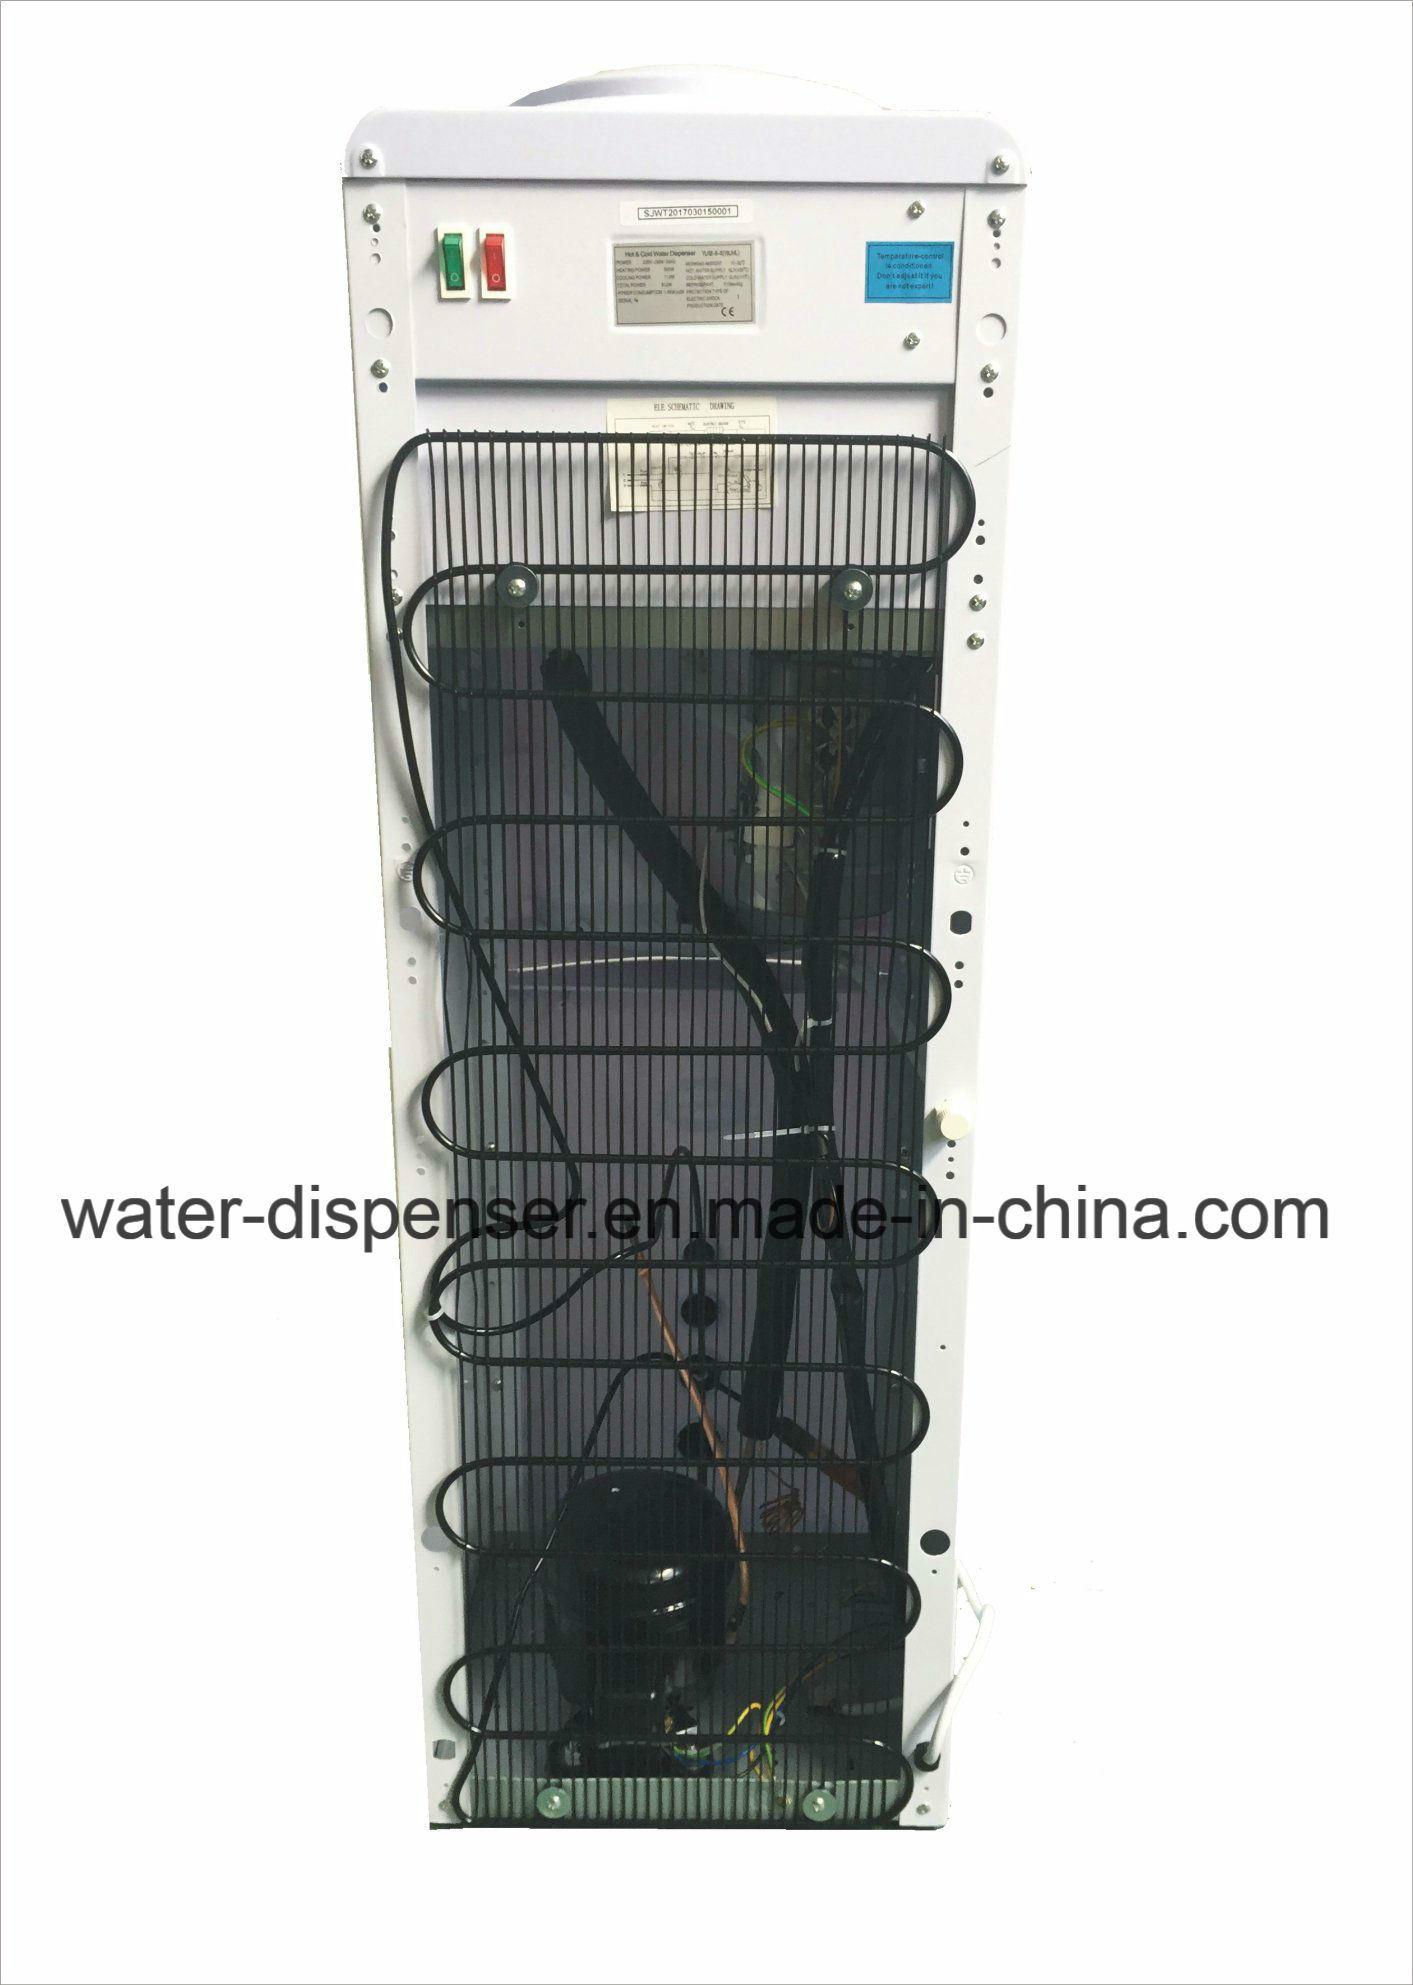 New Popular Pipeline Water Cooler Compressor Cooling 105L-G